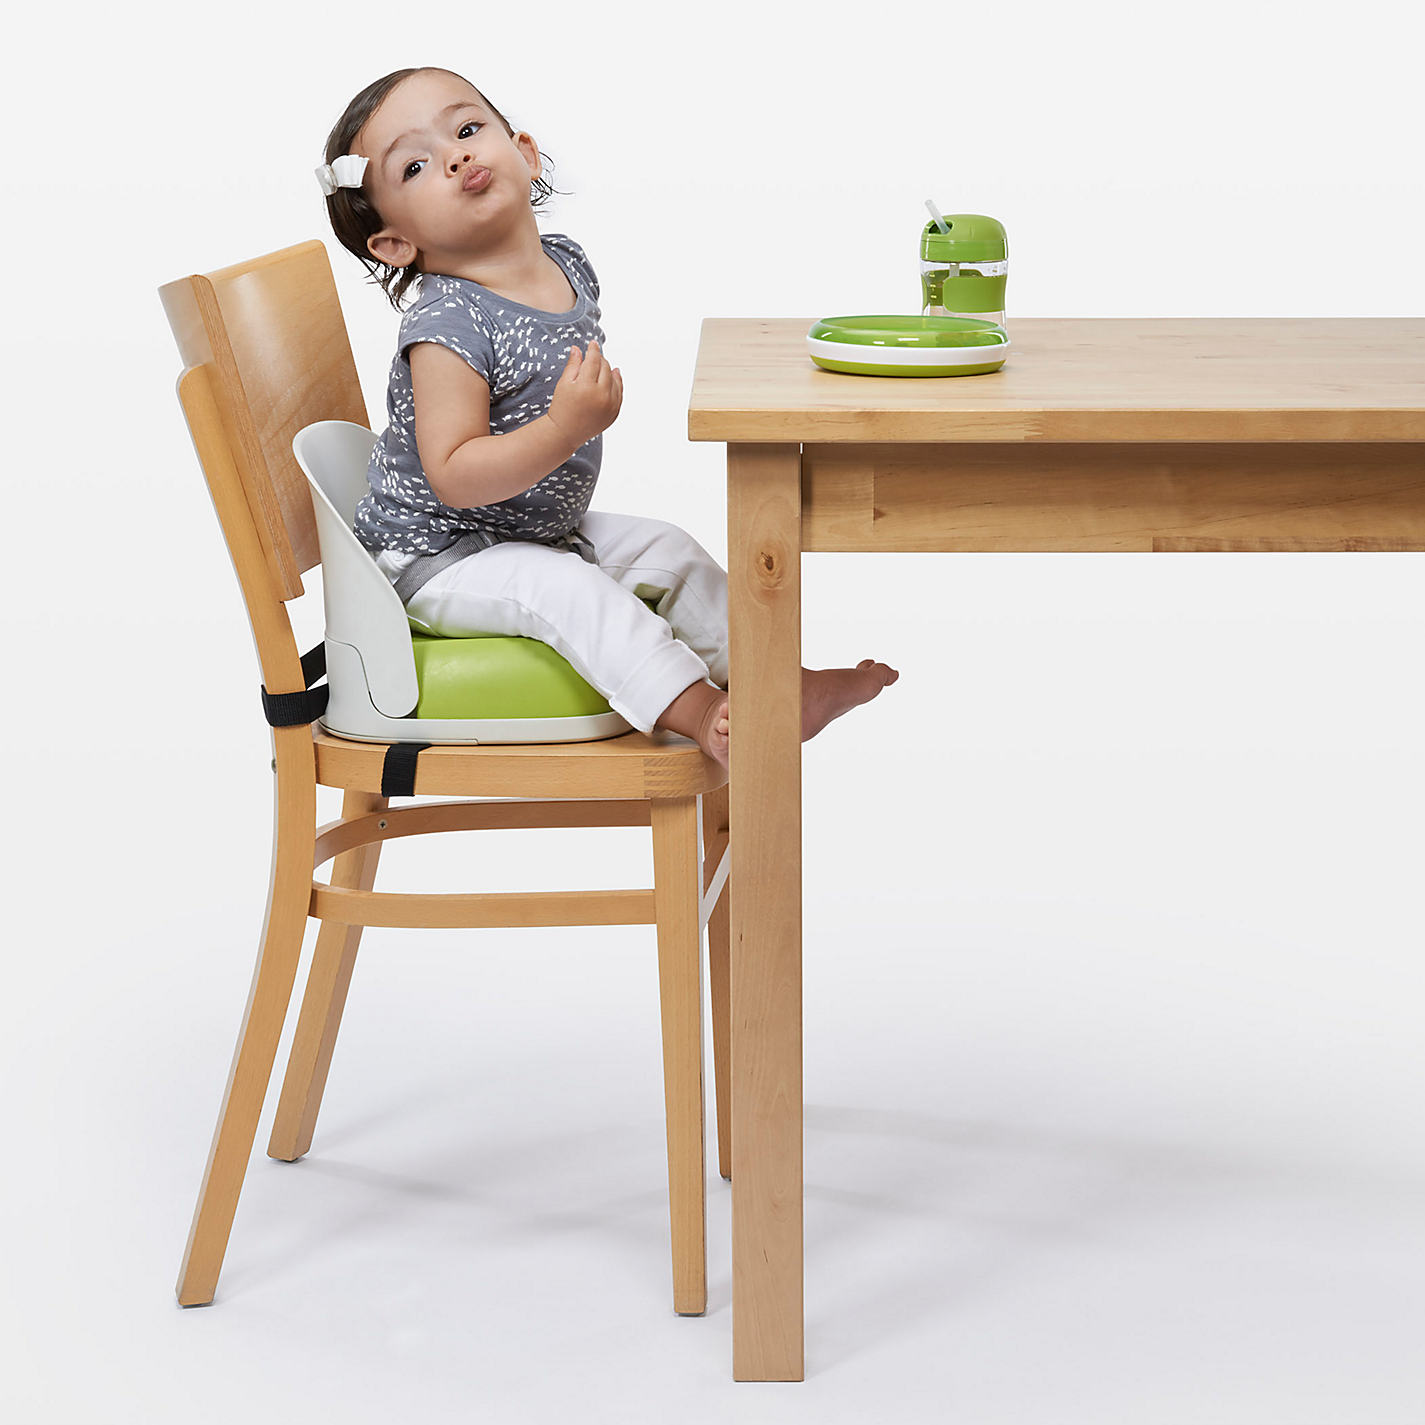 buy oxo tot perch feeding booster seat  john lewis -  buy oxo tot perch feeding booster seat online at johnlewiscom